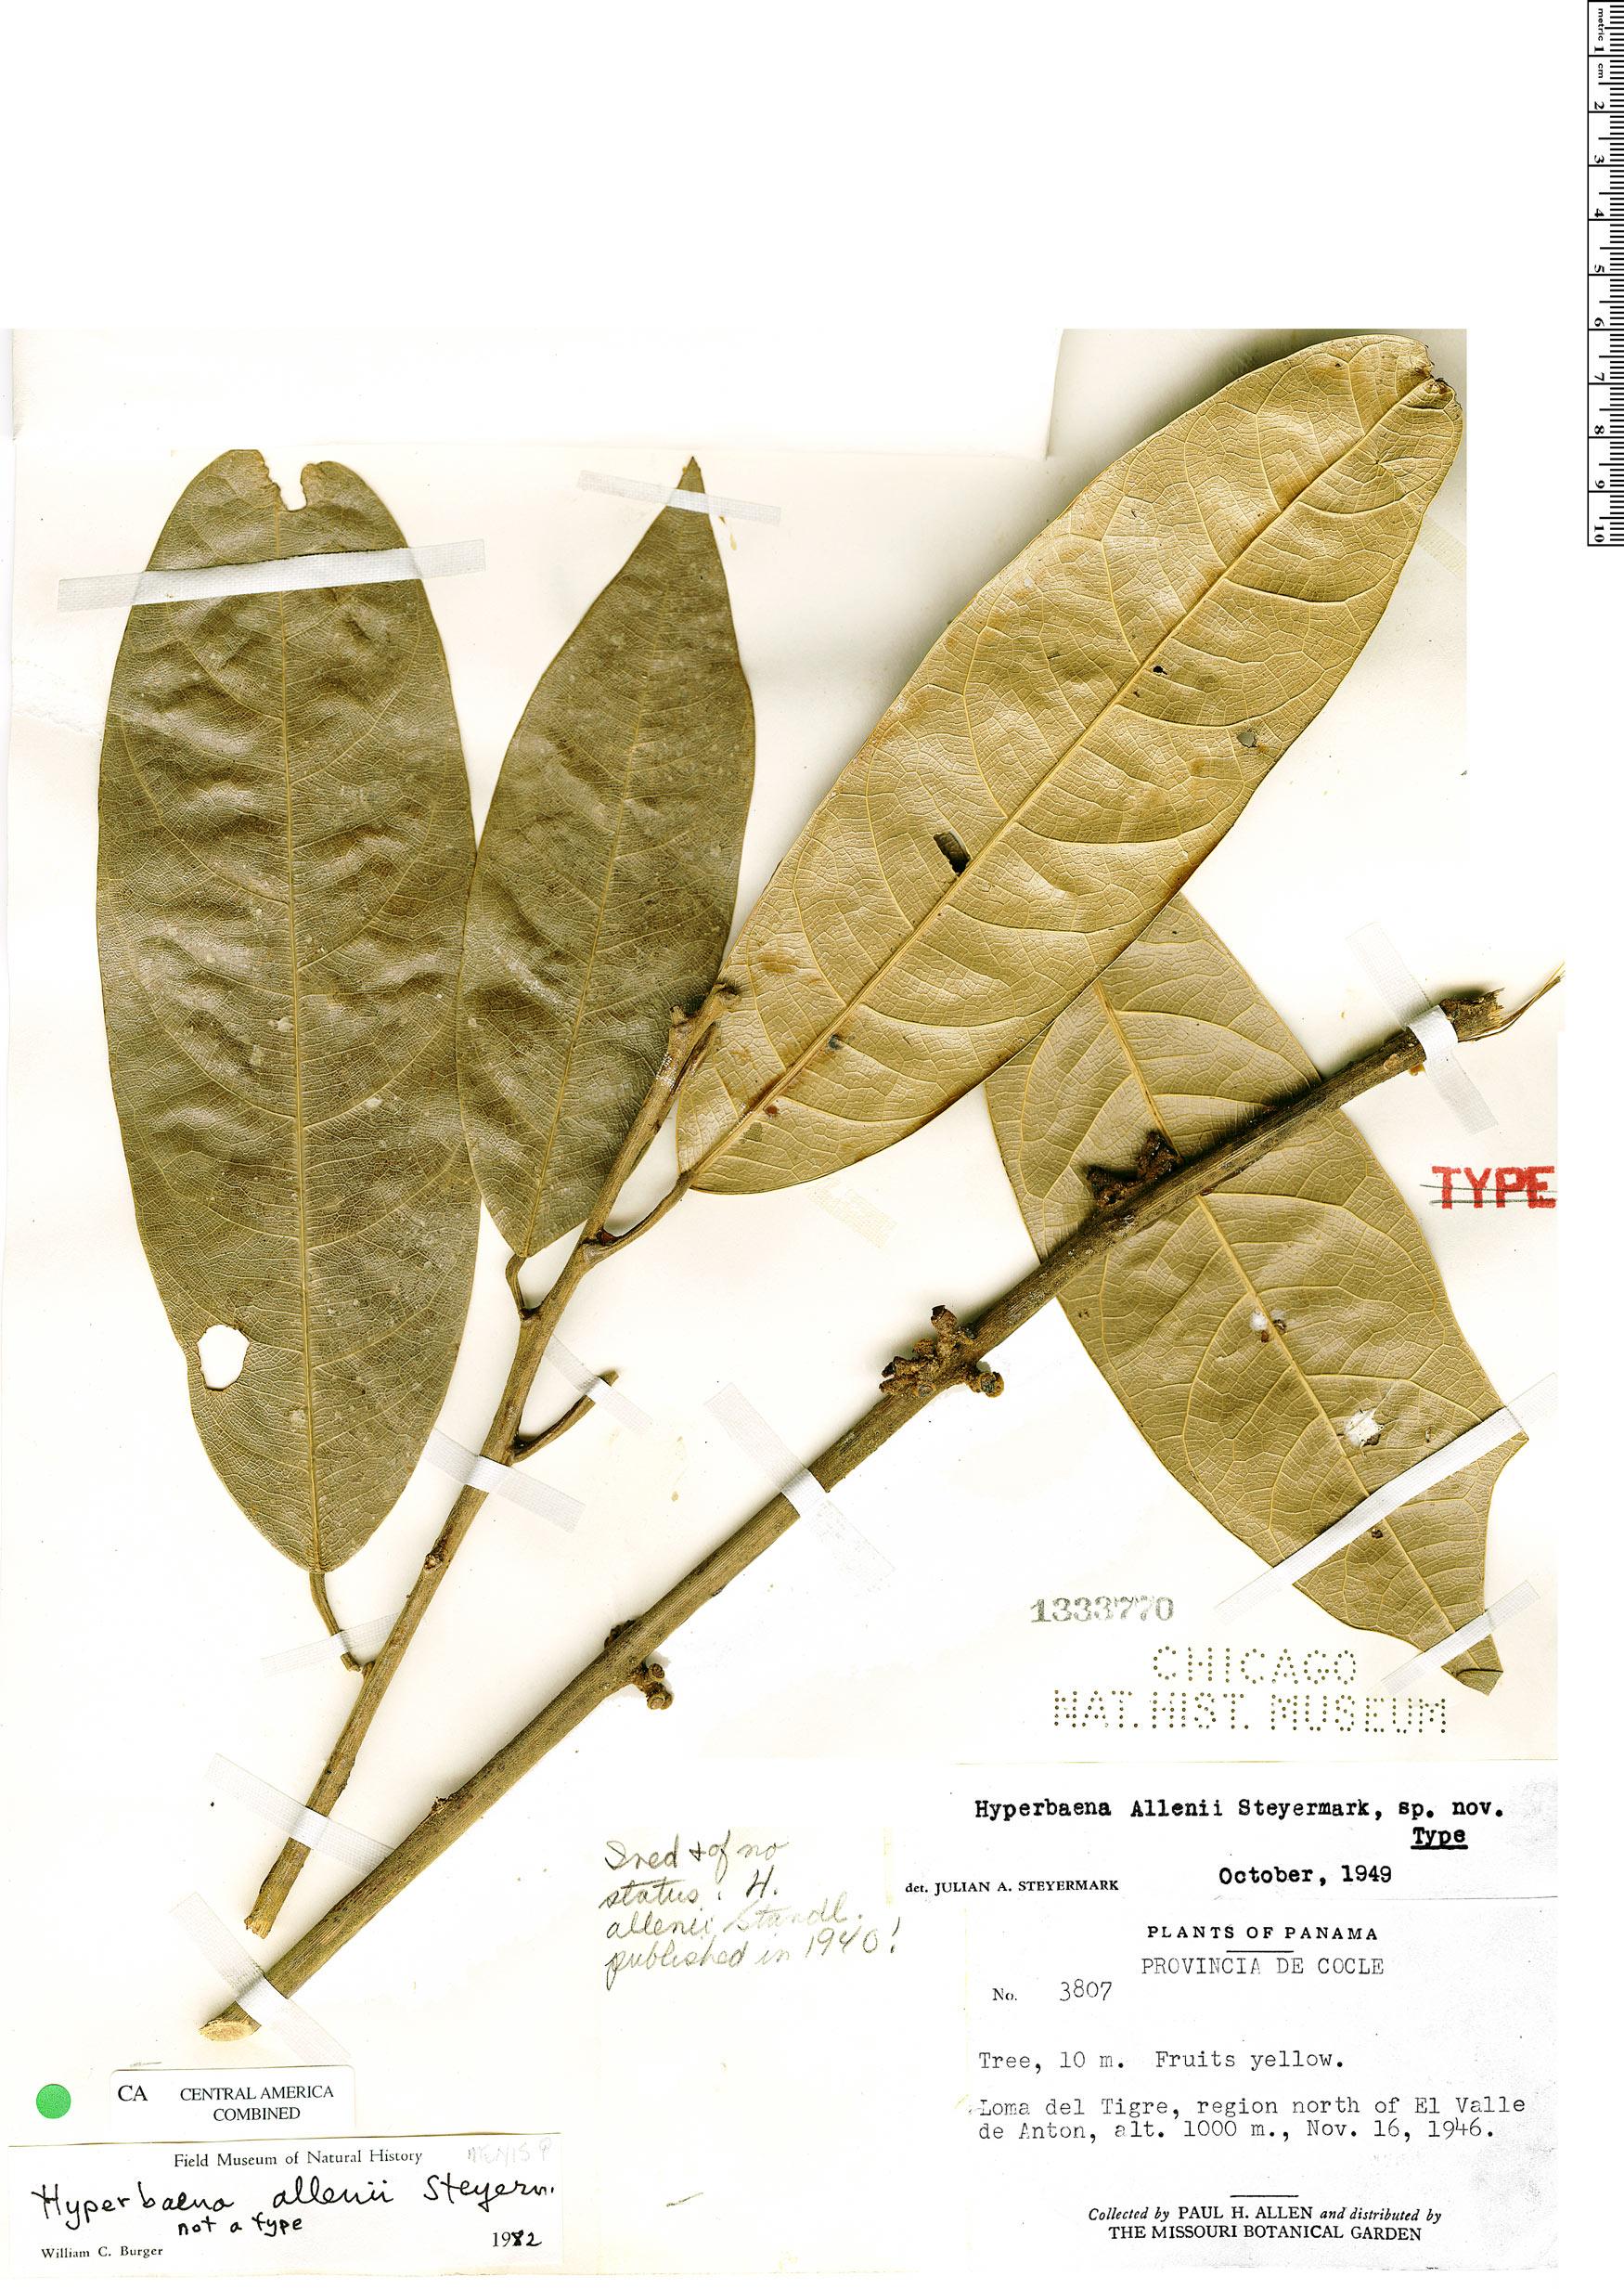 Specimen: Hyperbaena allenii